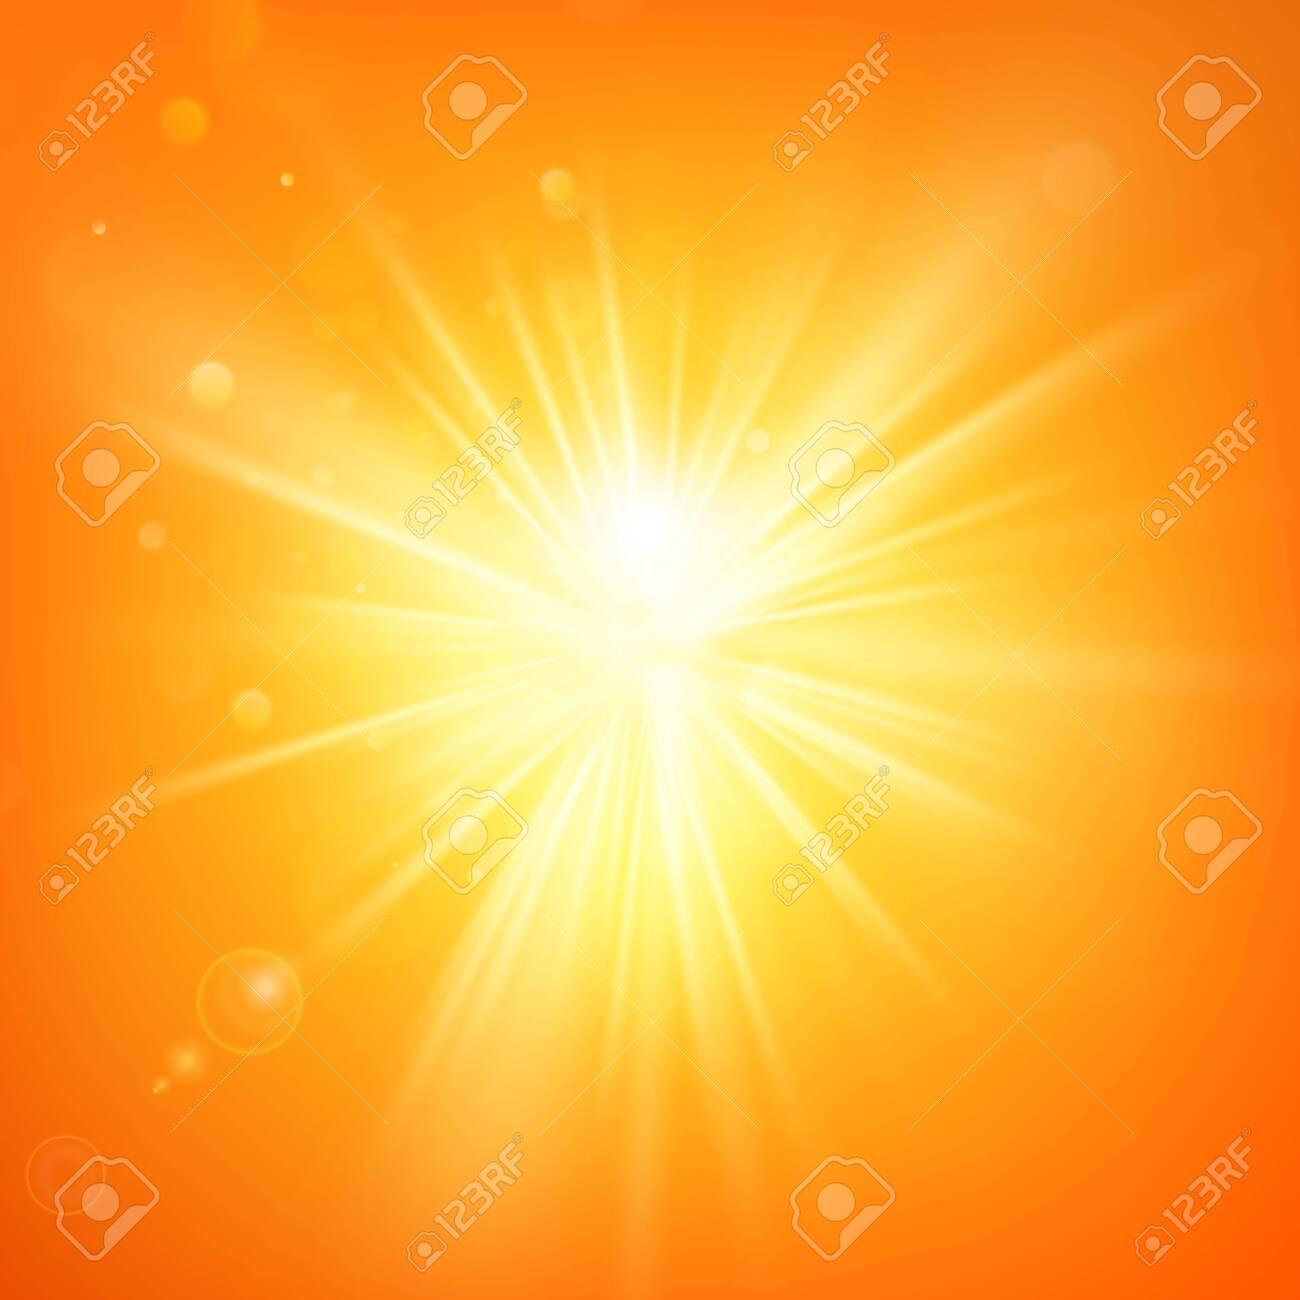 Summer template hot summer sun rays burst with lens flare. - 144110258